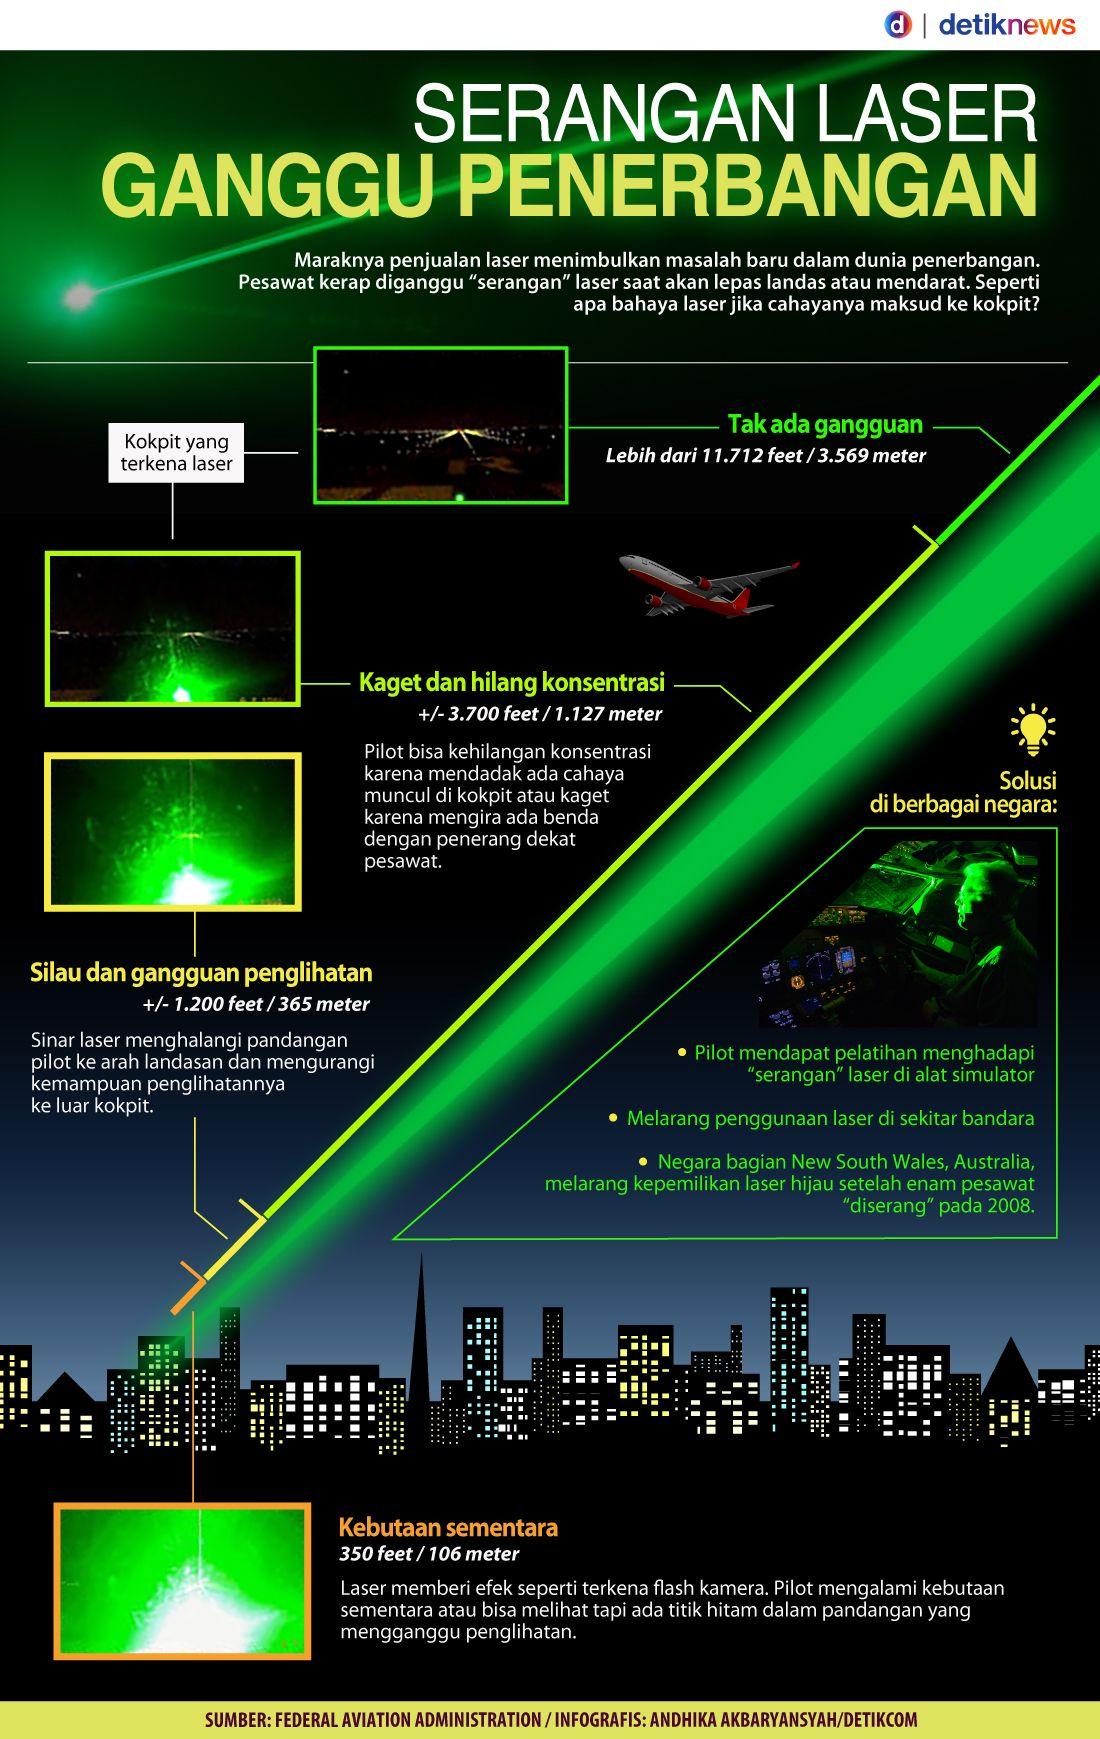 Laser Hijau Mainan Berbahaya Yang Bisa Menembak Hingga 5 Km Lampu Tembak 2mata Sj0021 Surat Itu Juga Sudah Disampaikan Ke Pemerintah Daerah Dan Segenap Instansi Agar Melarang Melaporkan Jika Ada Balon Atau Lentera Ucapnya